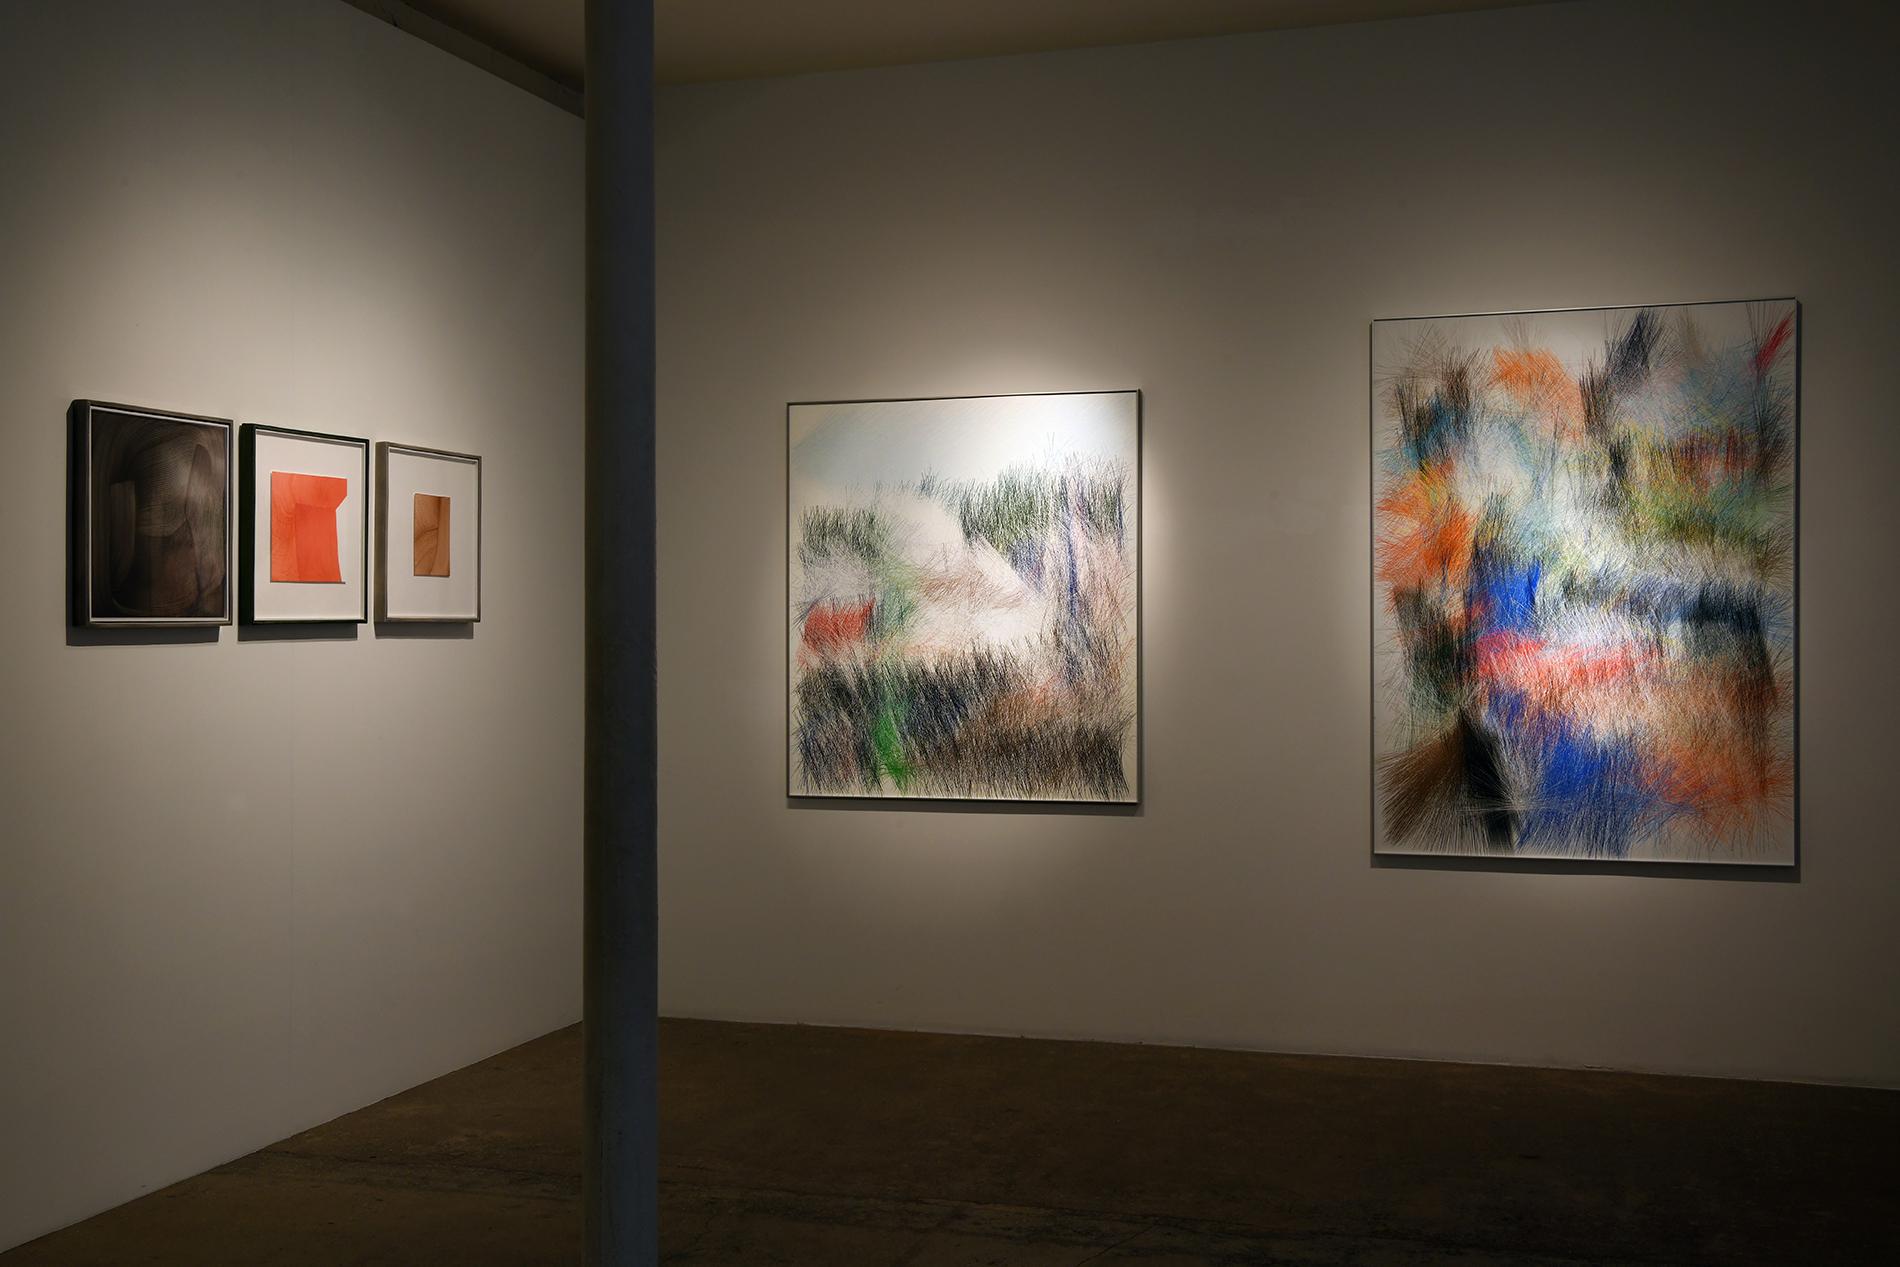 Galerie Kreo, exposition de dessins - Morgane Le Gall